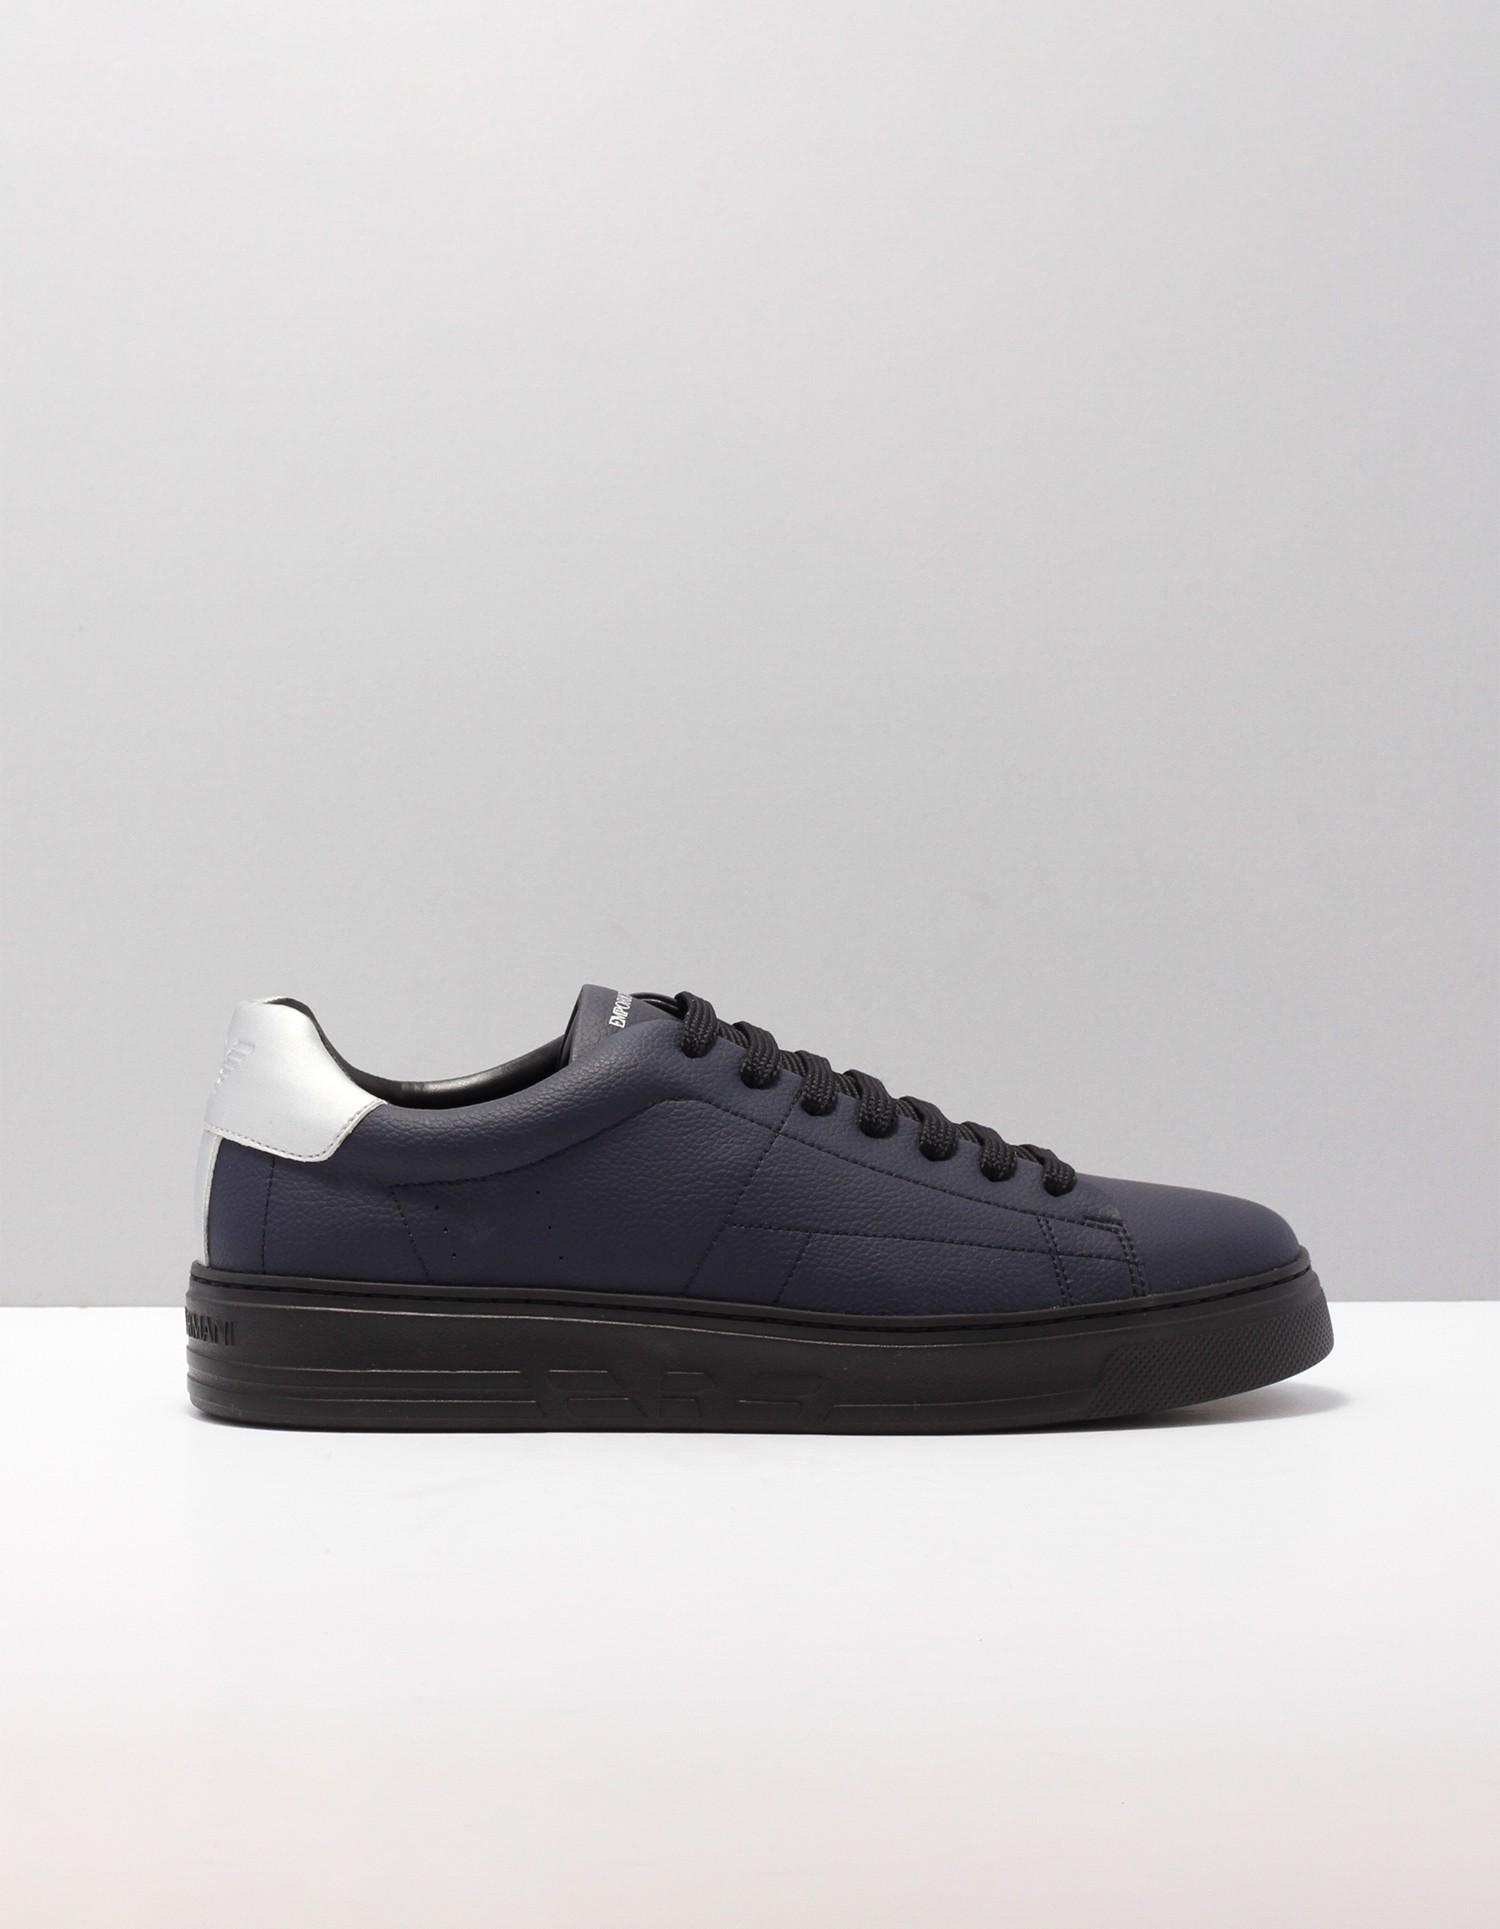 Afbeelding van Armani Jeans Sneakers blauw